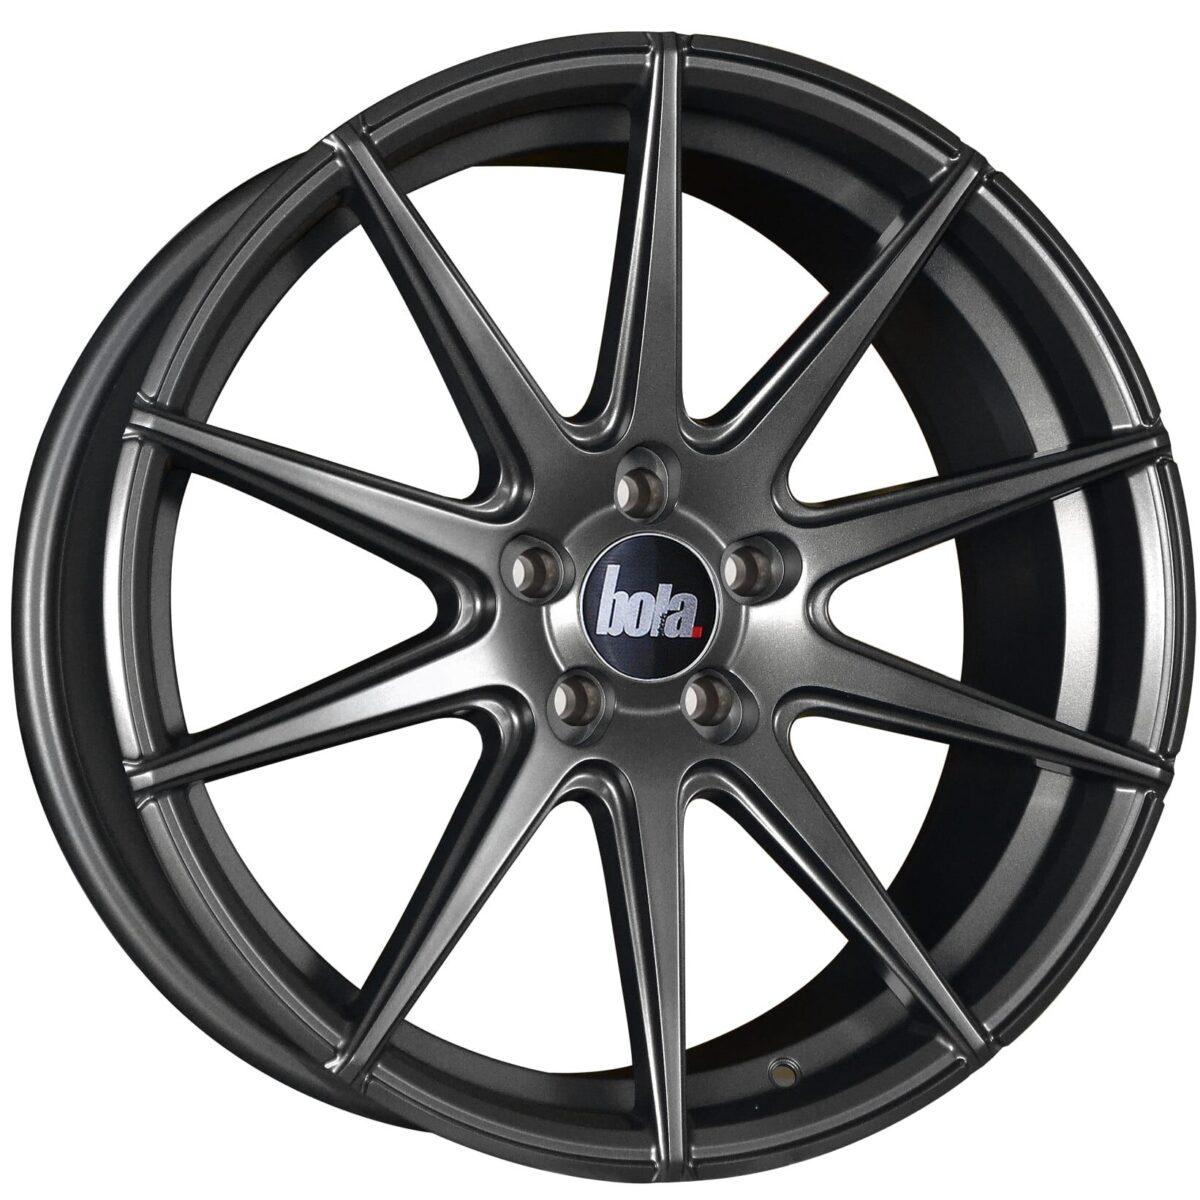 "19"" BOLA CSR Wheels - Matt Gunmetal - VW / Audi / Mercedes - 5x112"